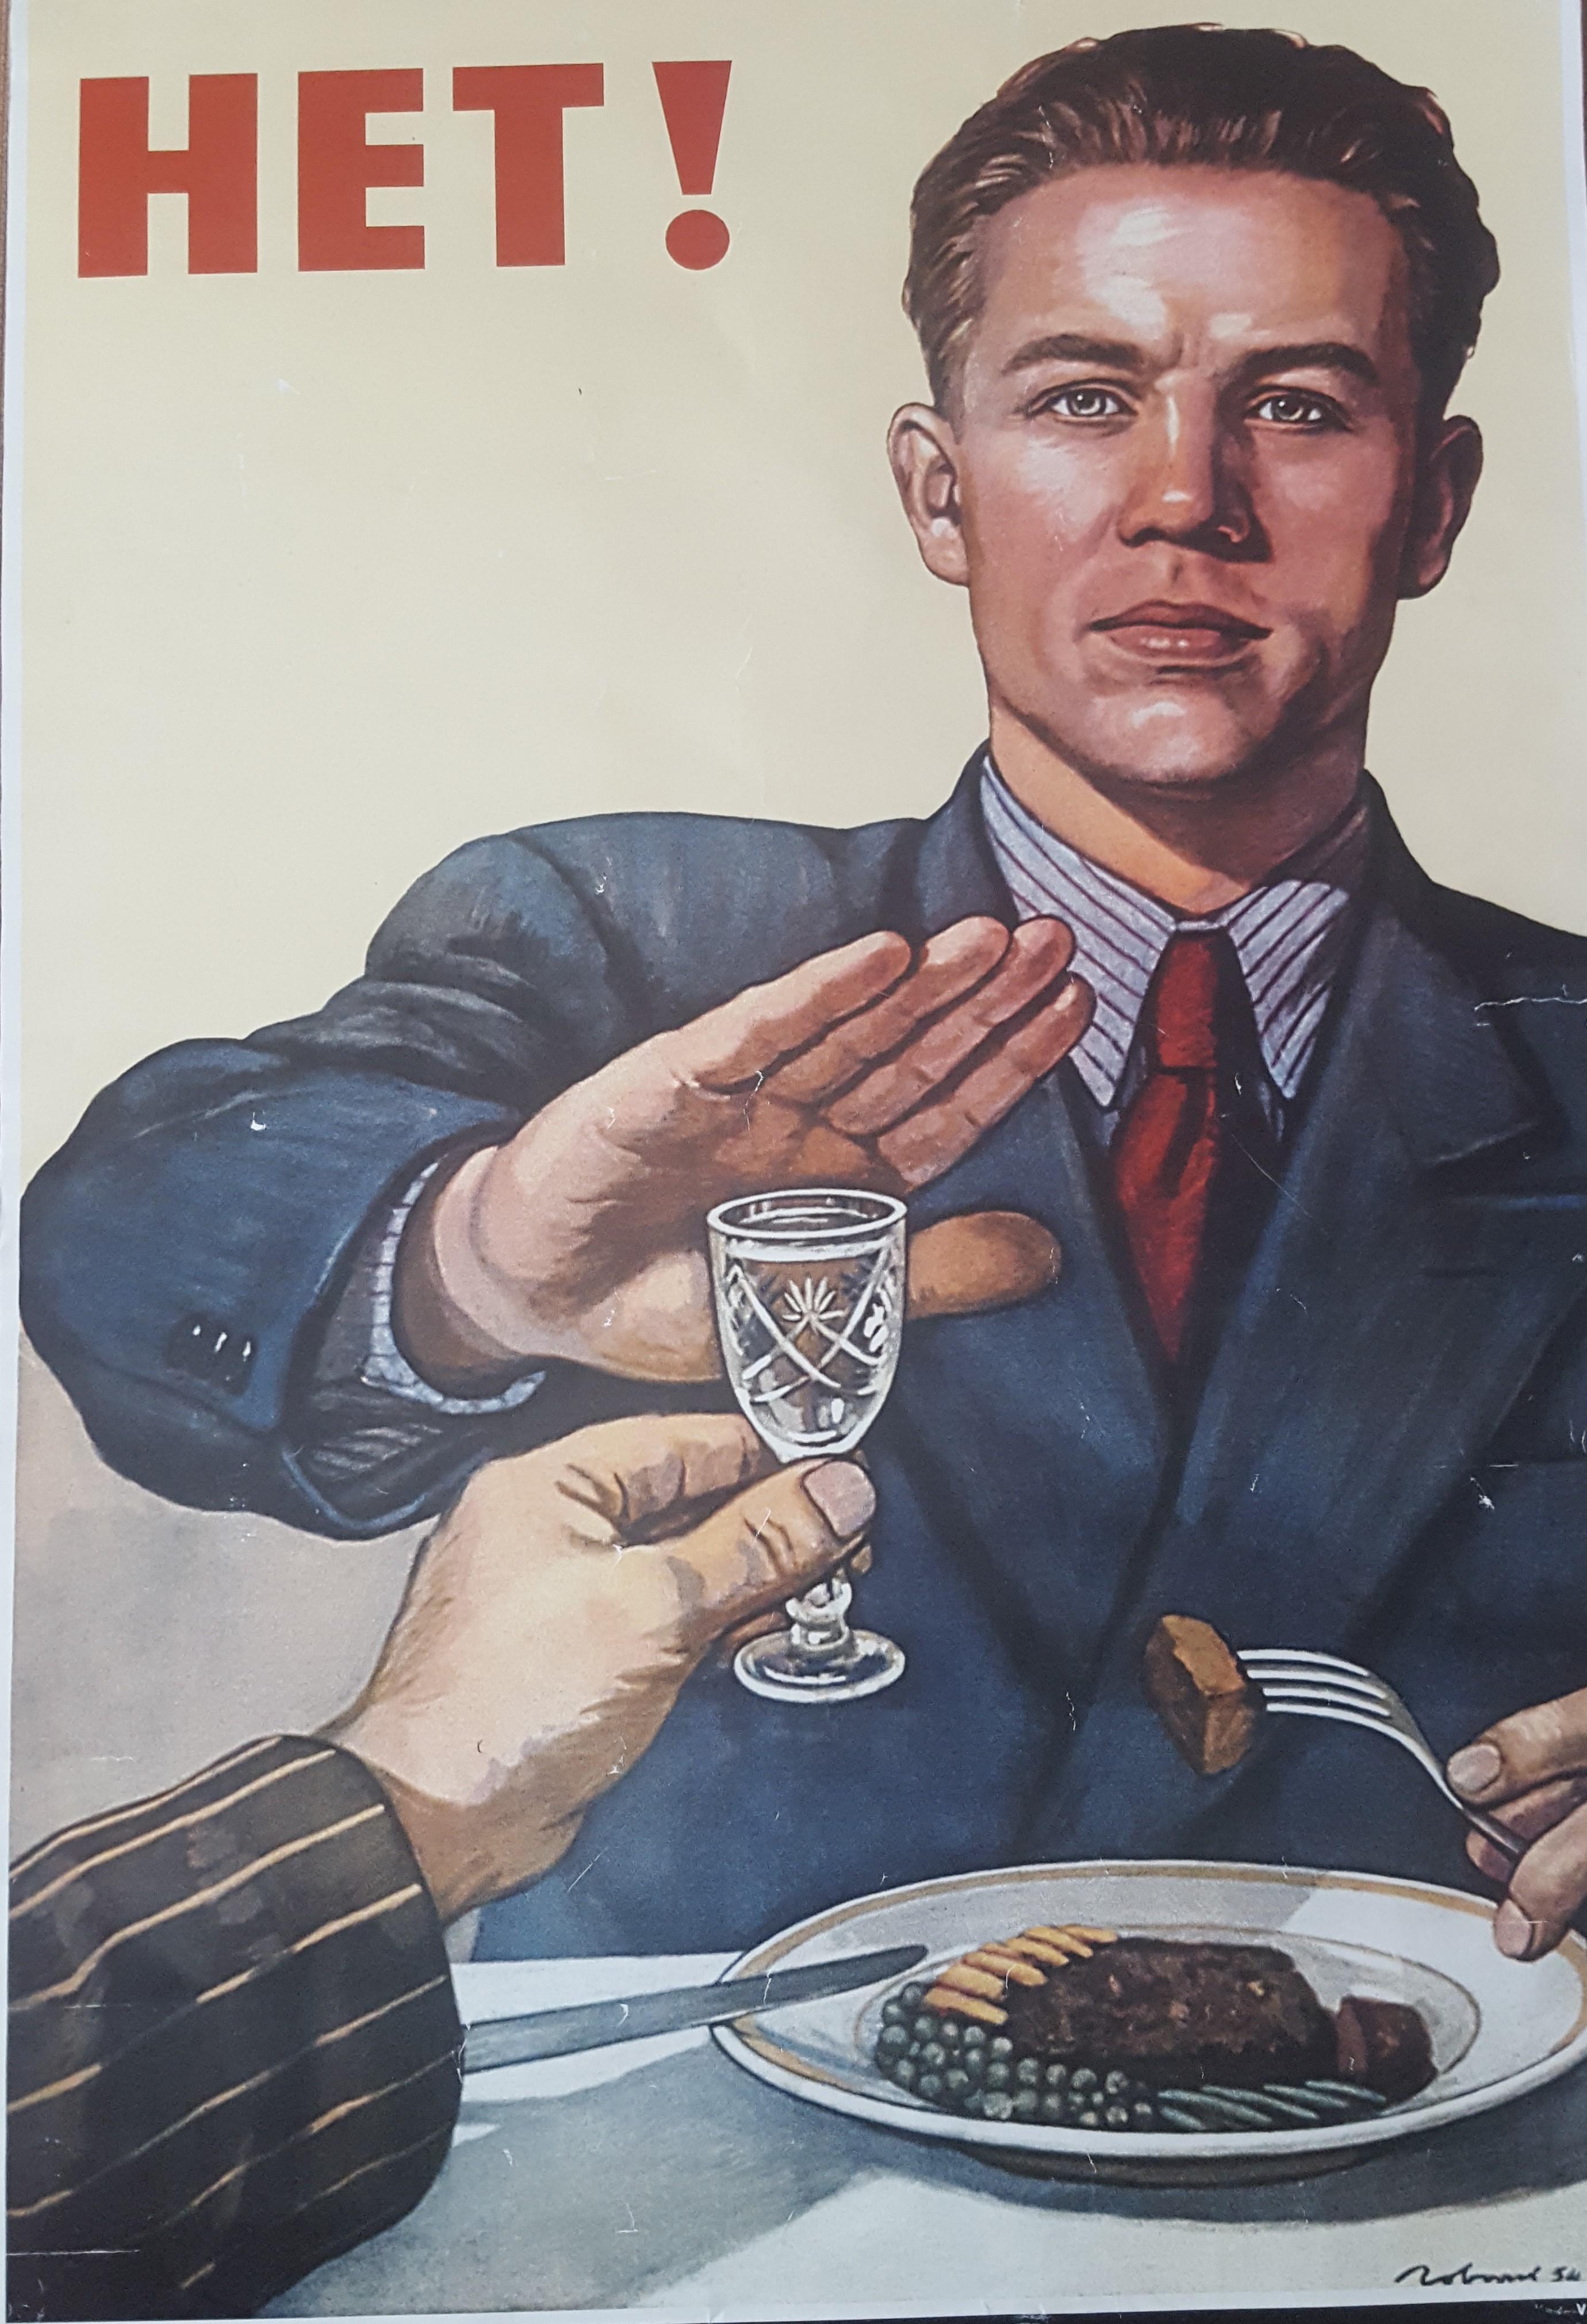 alcohol consumption? No thanks